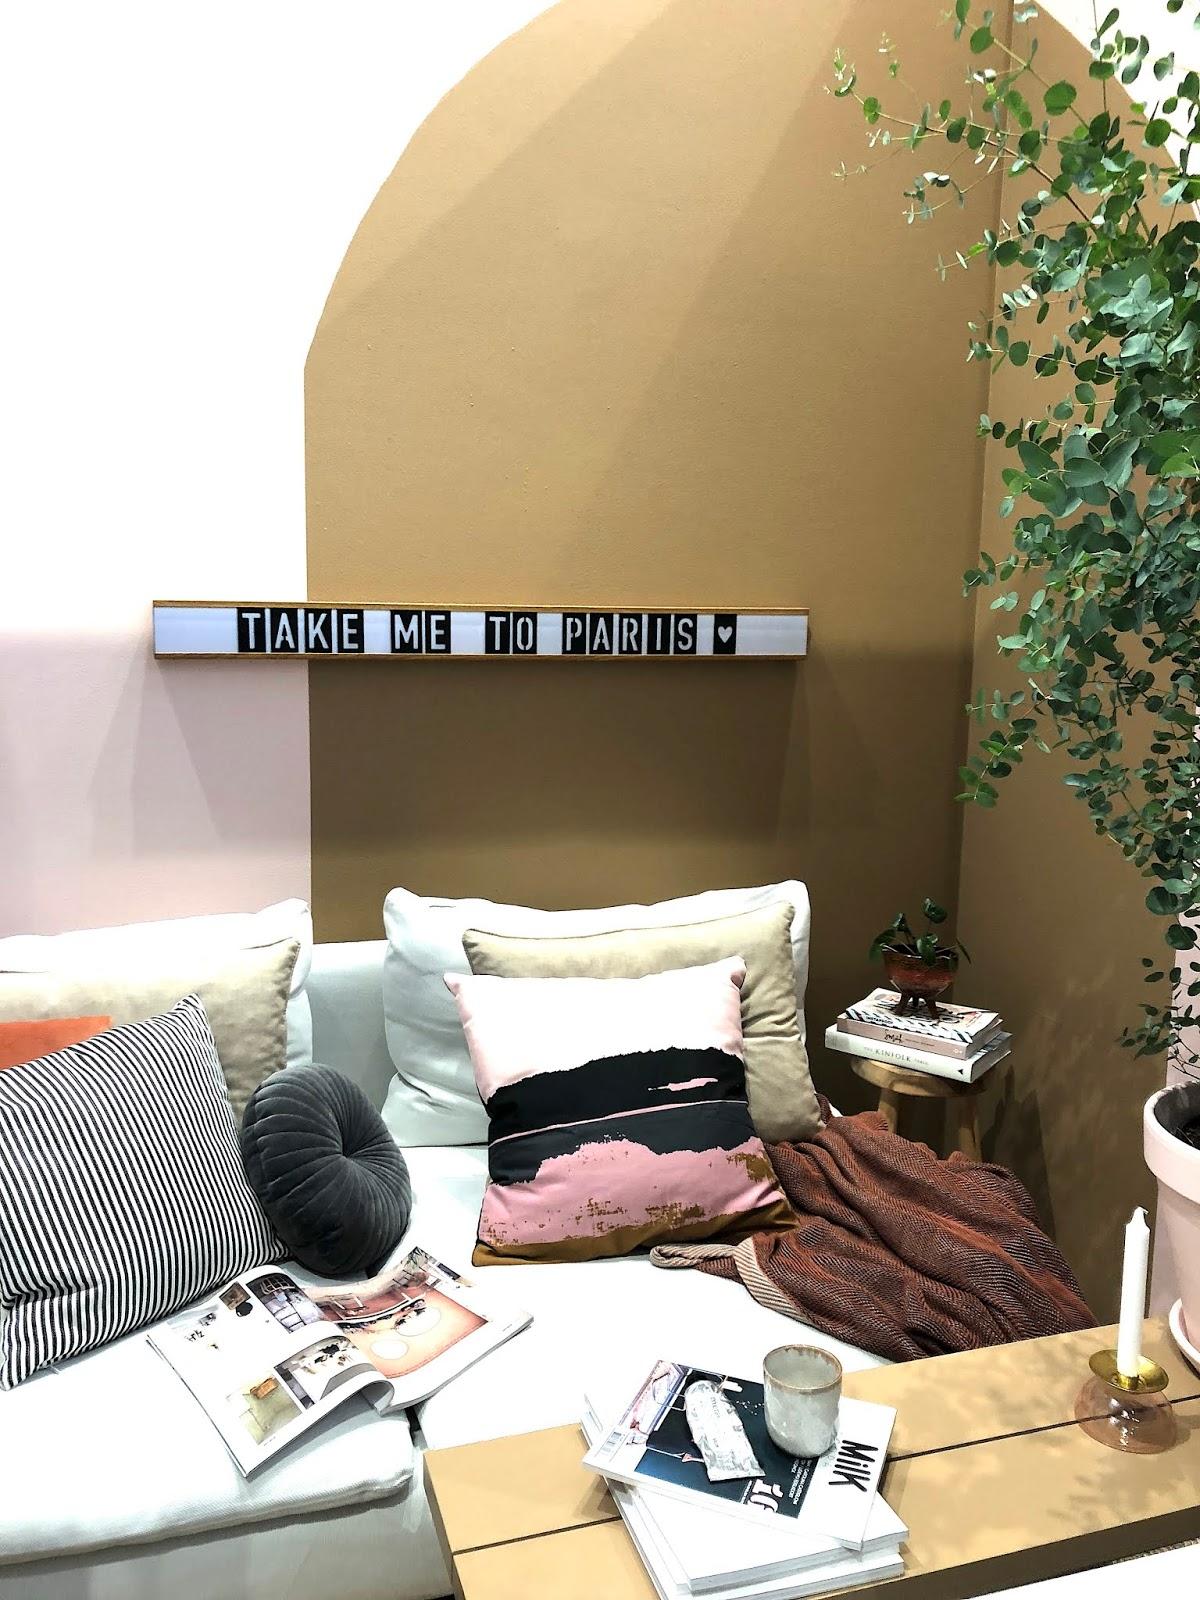 Flexa Slaapkamer Compleet.Soyz Blog Inspiratie Vtwonen Designbeurs Amsterdam 2018 Flexa